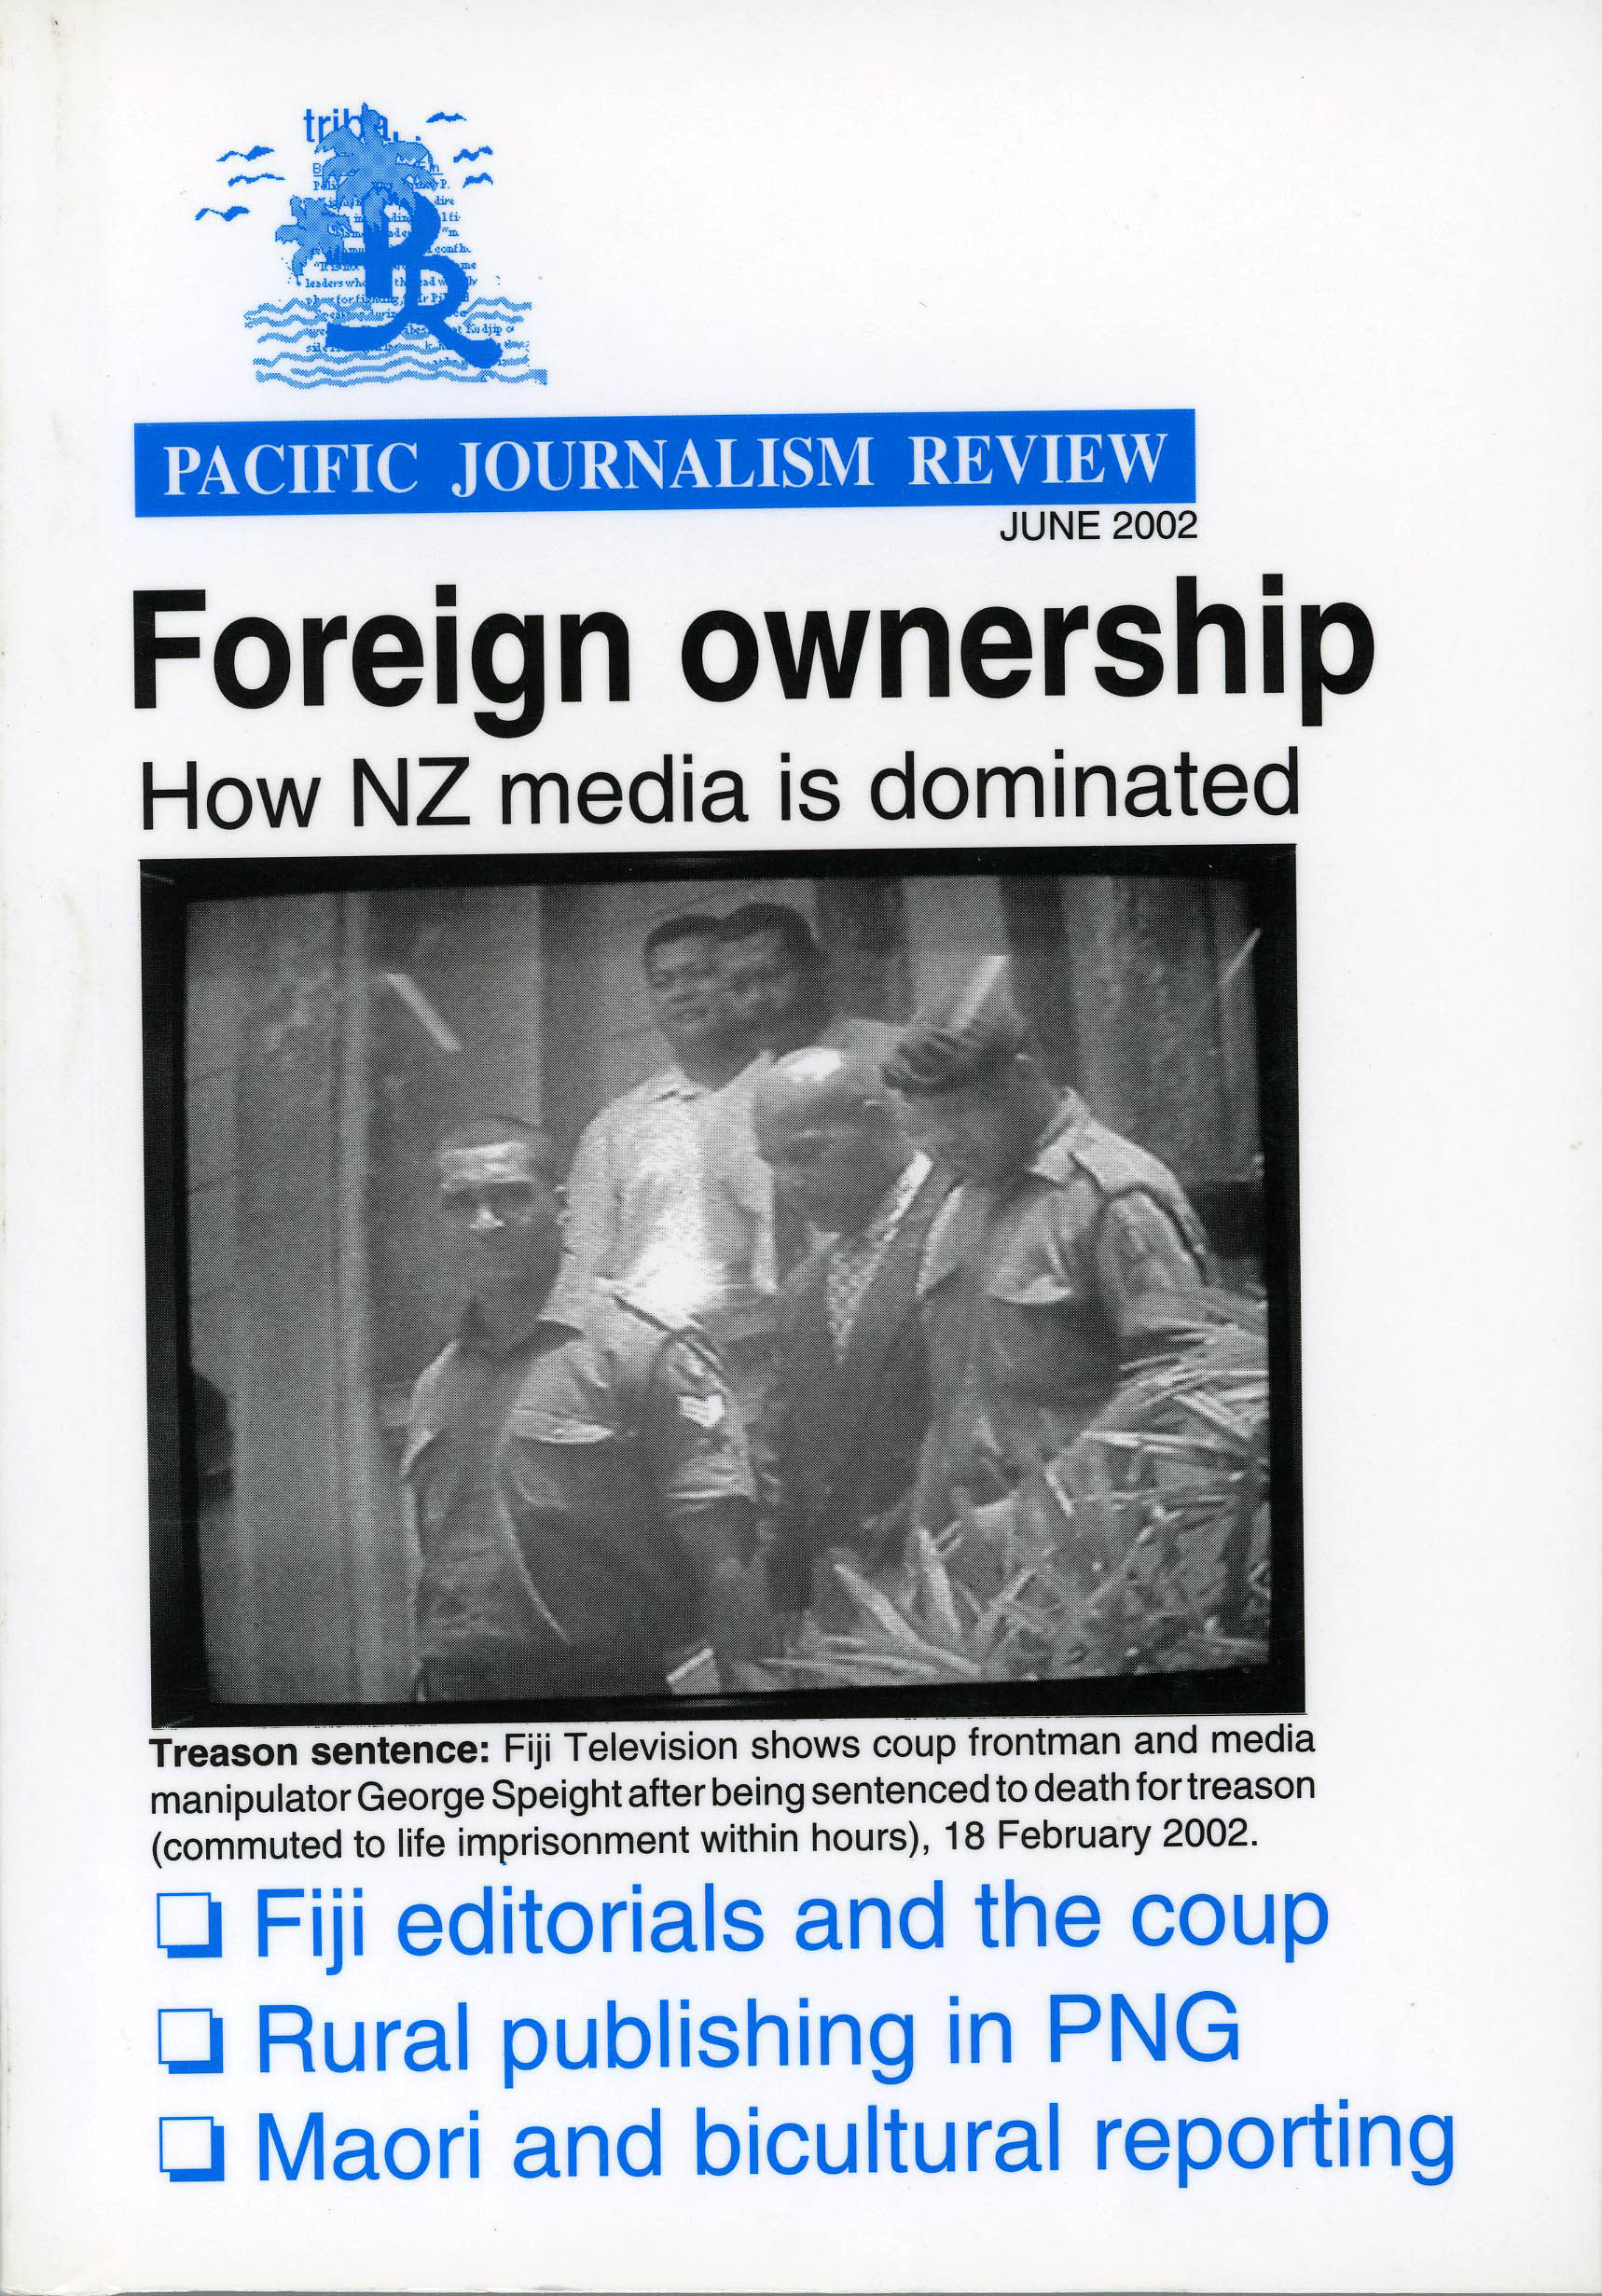 PJR cover 8 June 2002